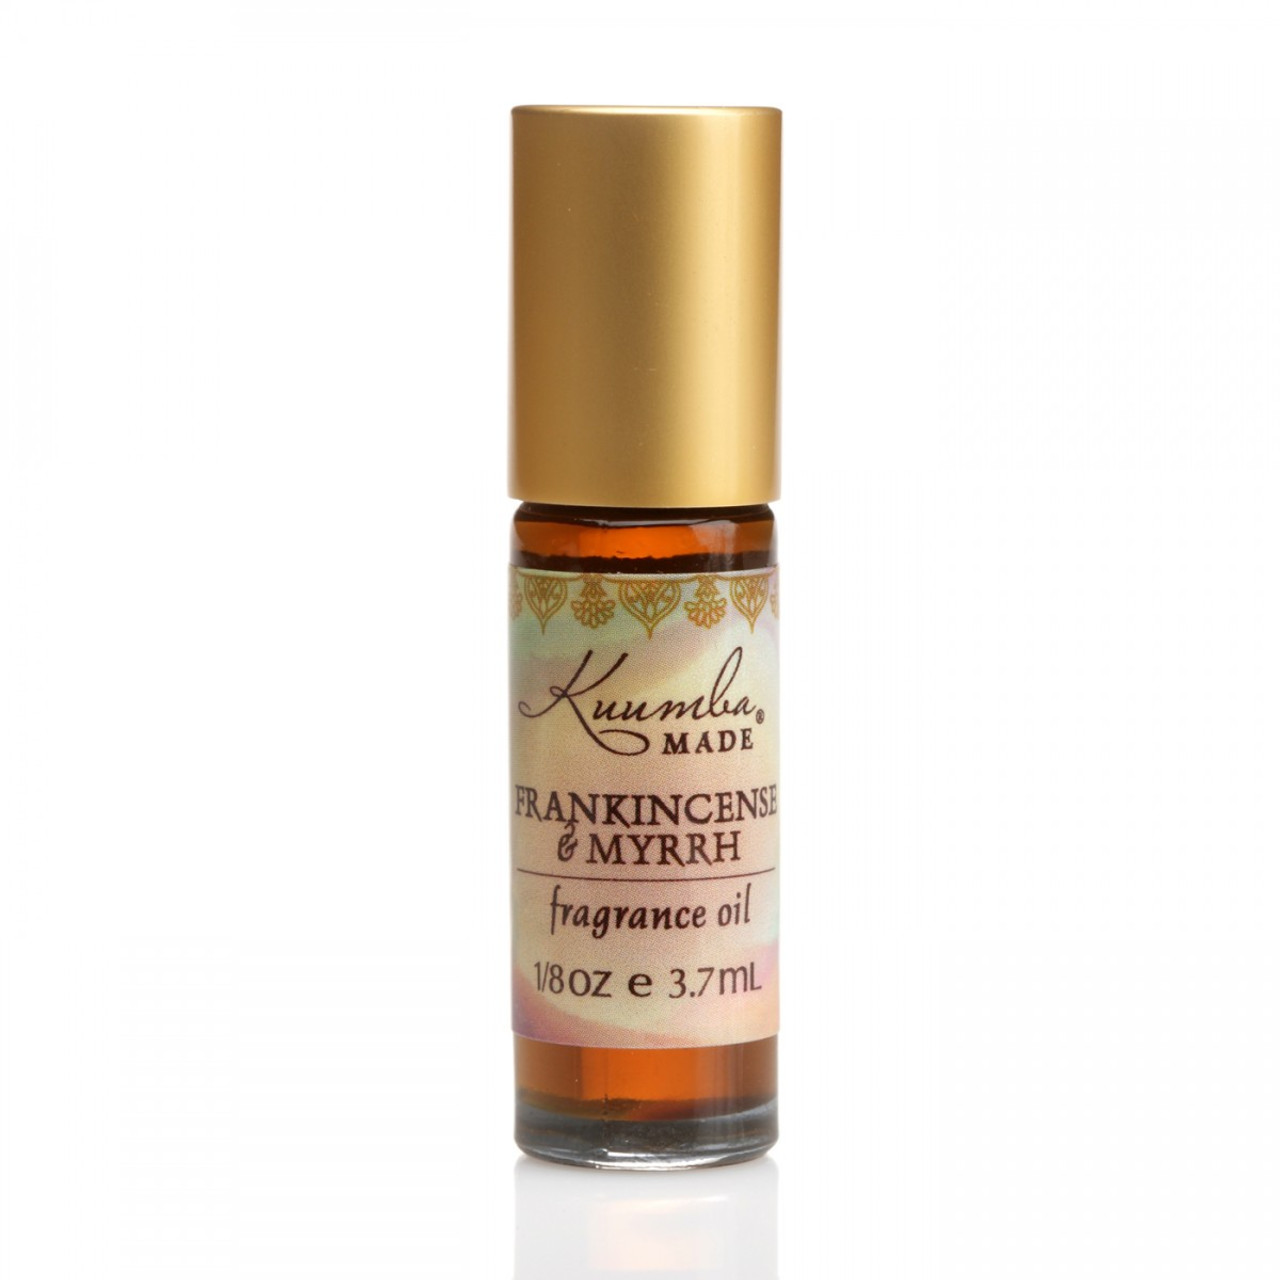 Kuumba Made Frankincense & Myrrh Fragrance Oil